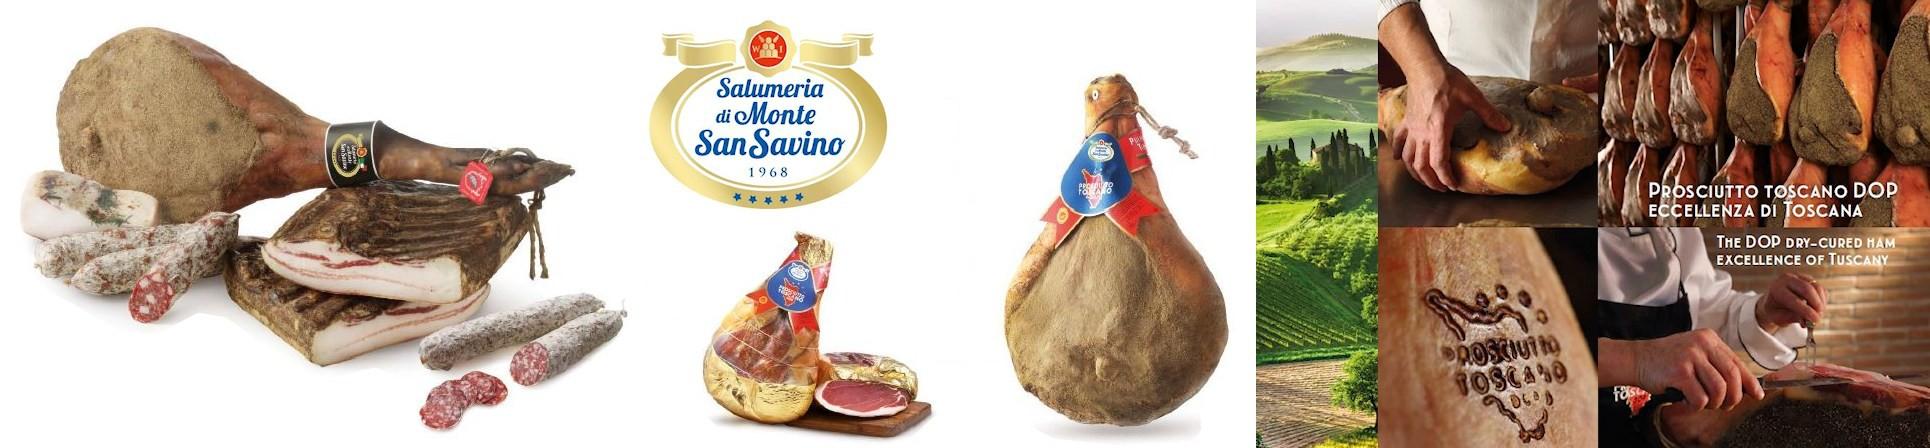 Antica Salumeria di Monte San Savino - vendita online